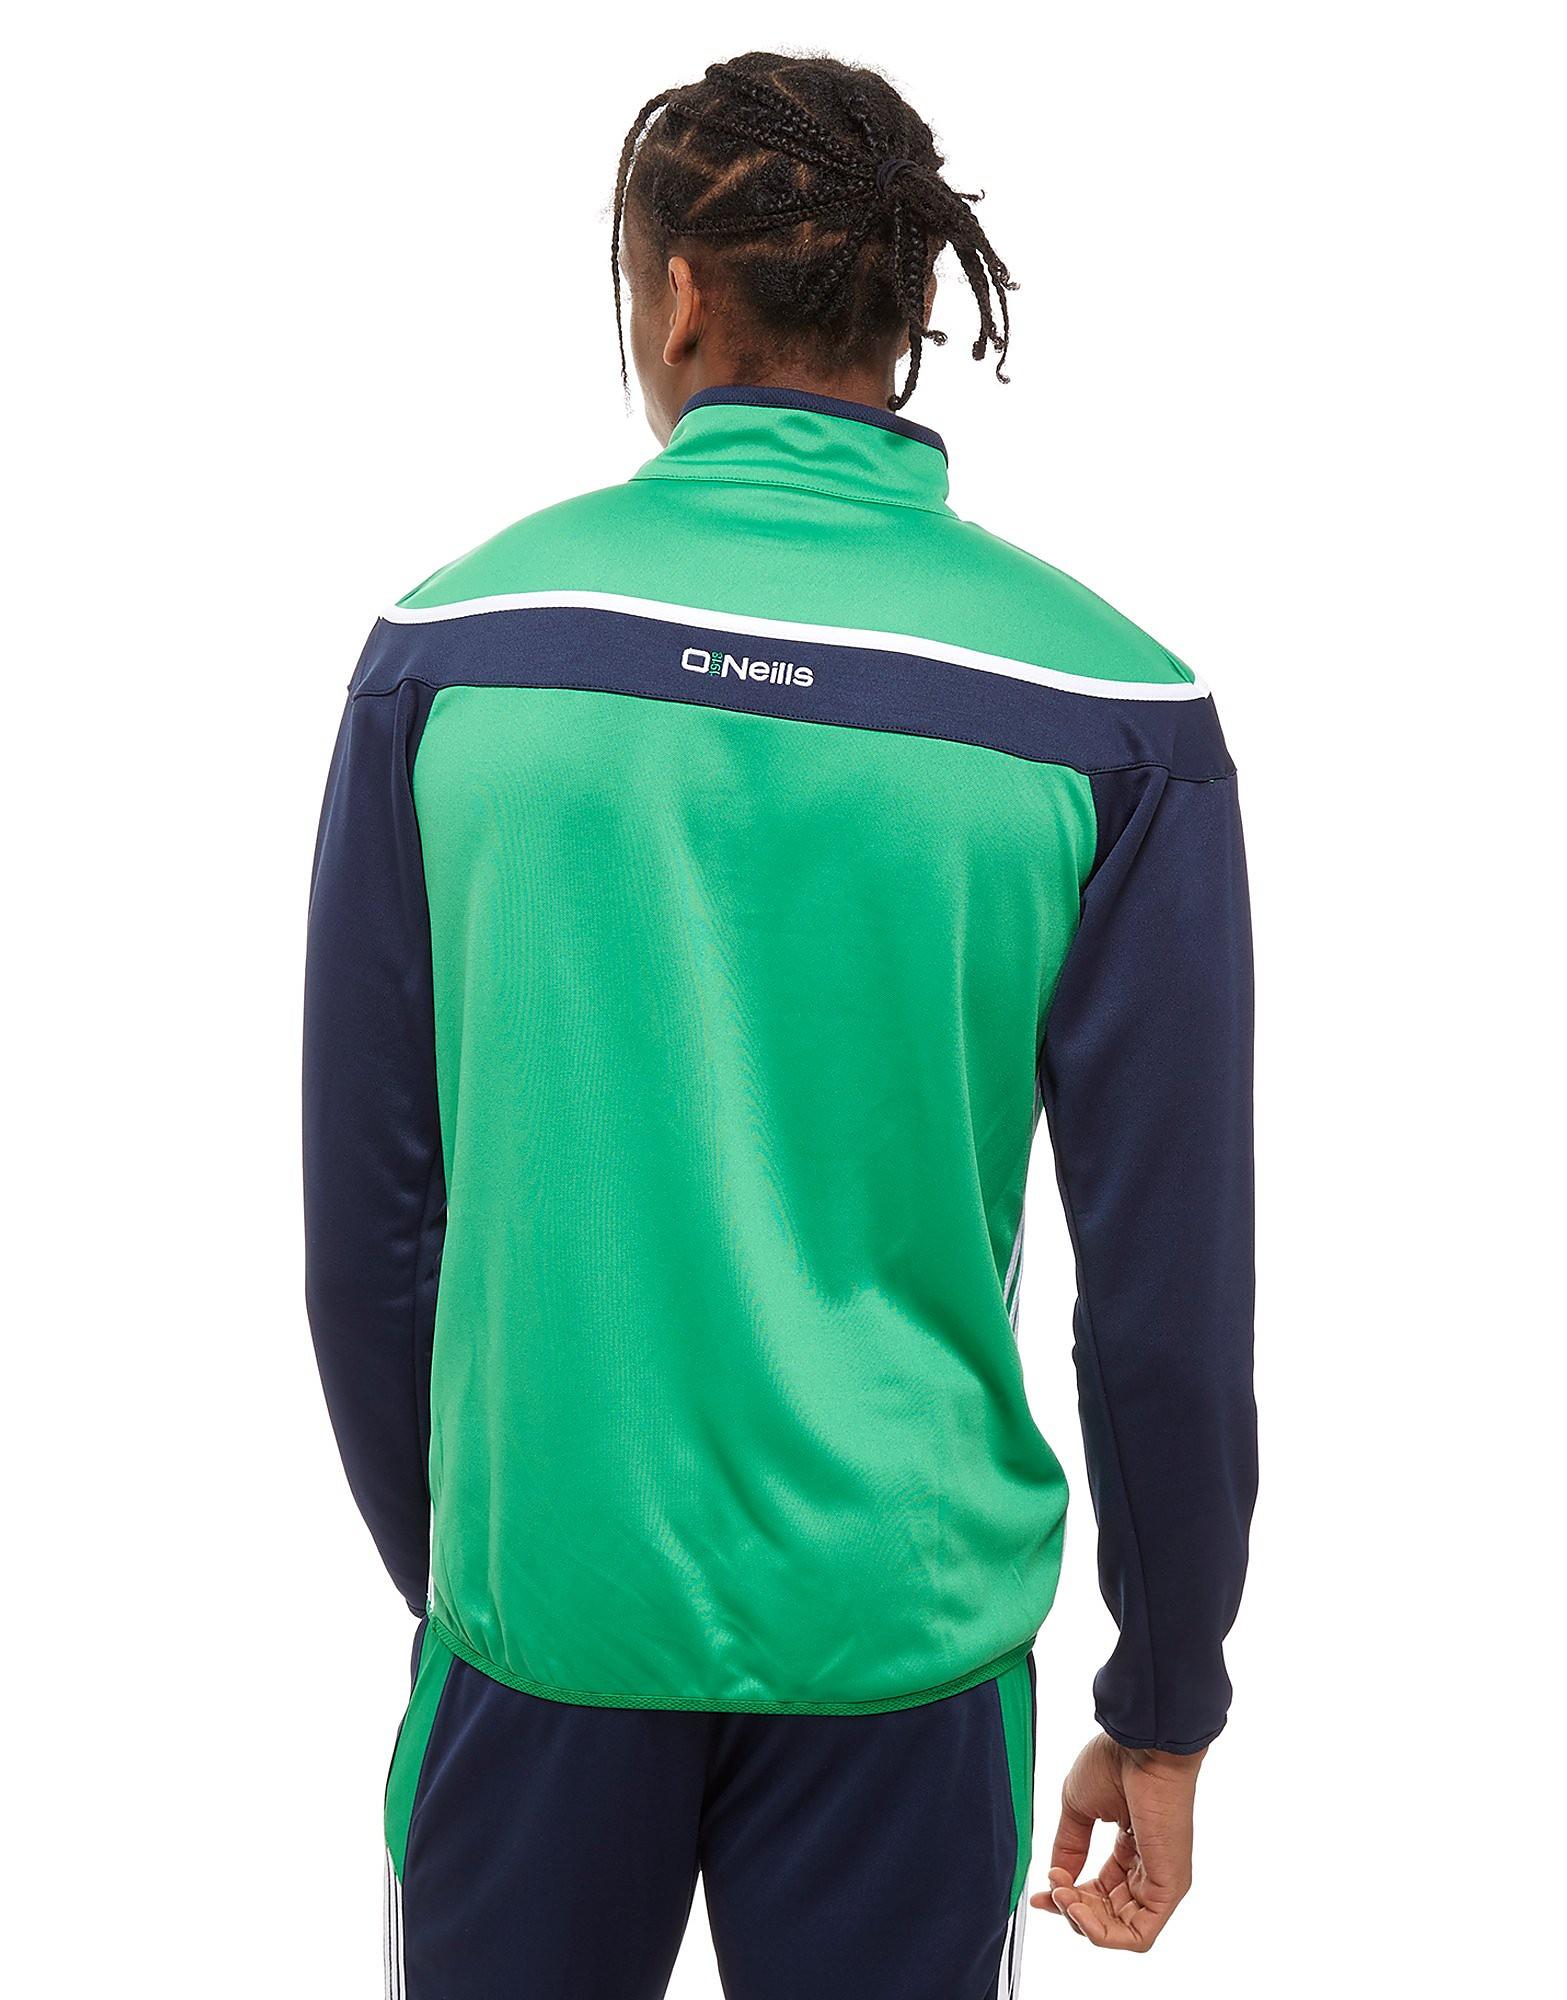 O'Neills Limerick Side Zip Top